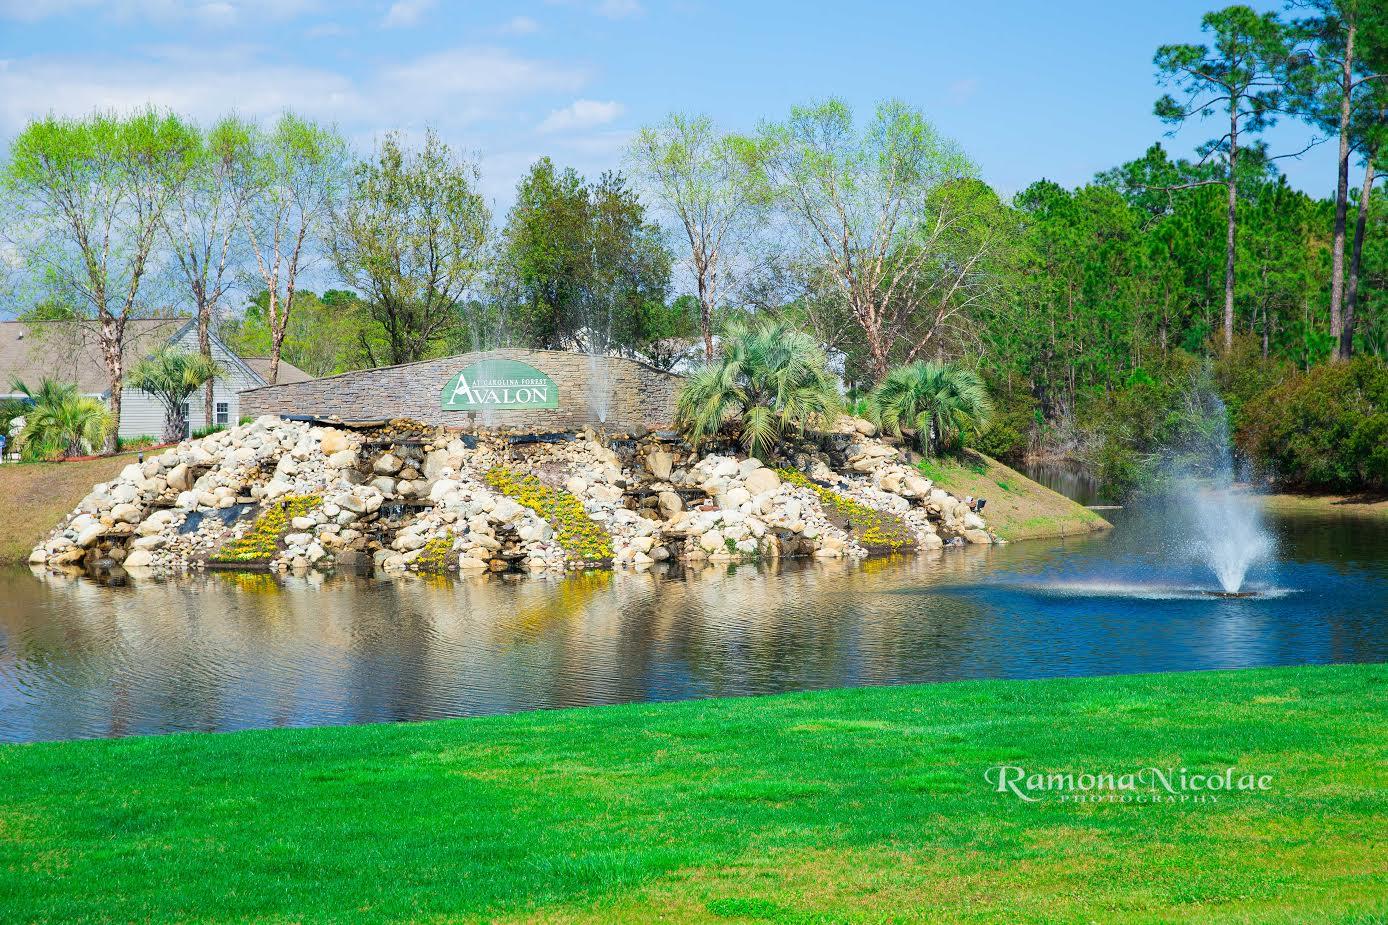 Carolina Forest Avalon Neighborhhod